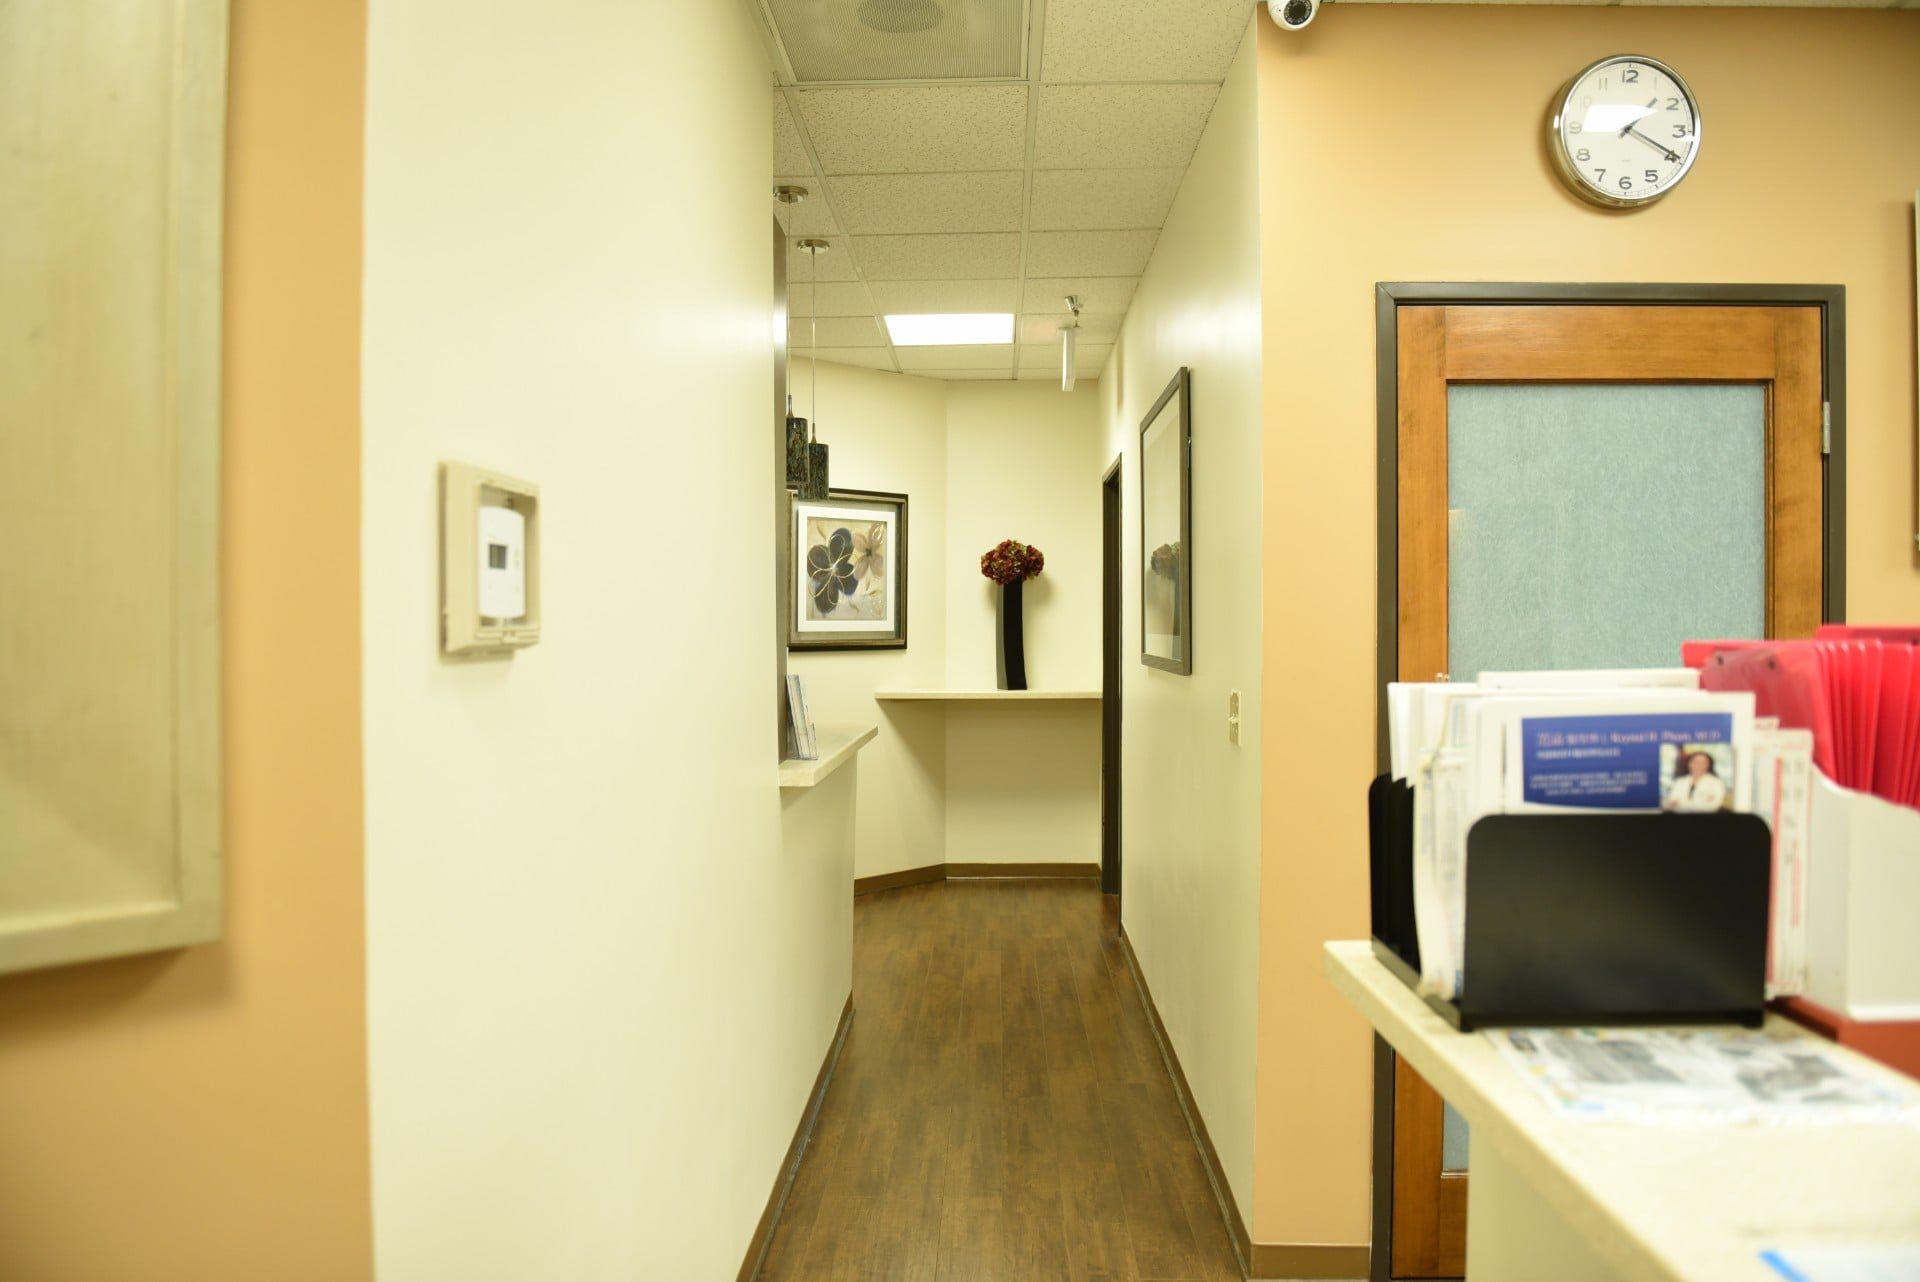 Hospital Office